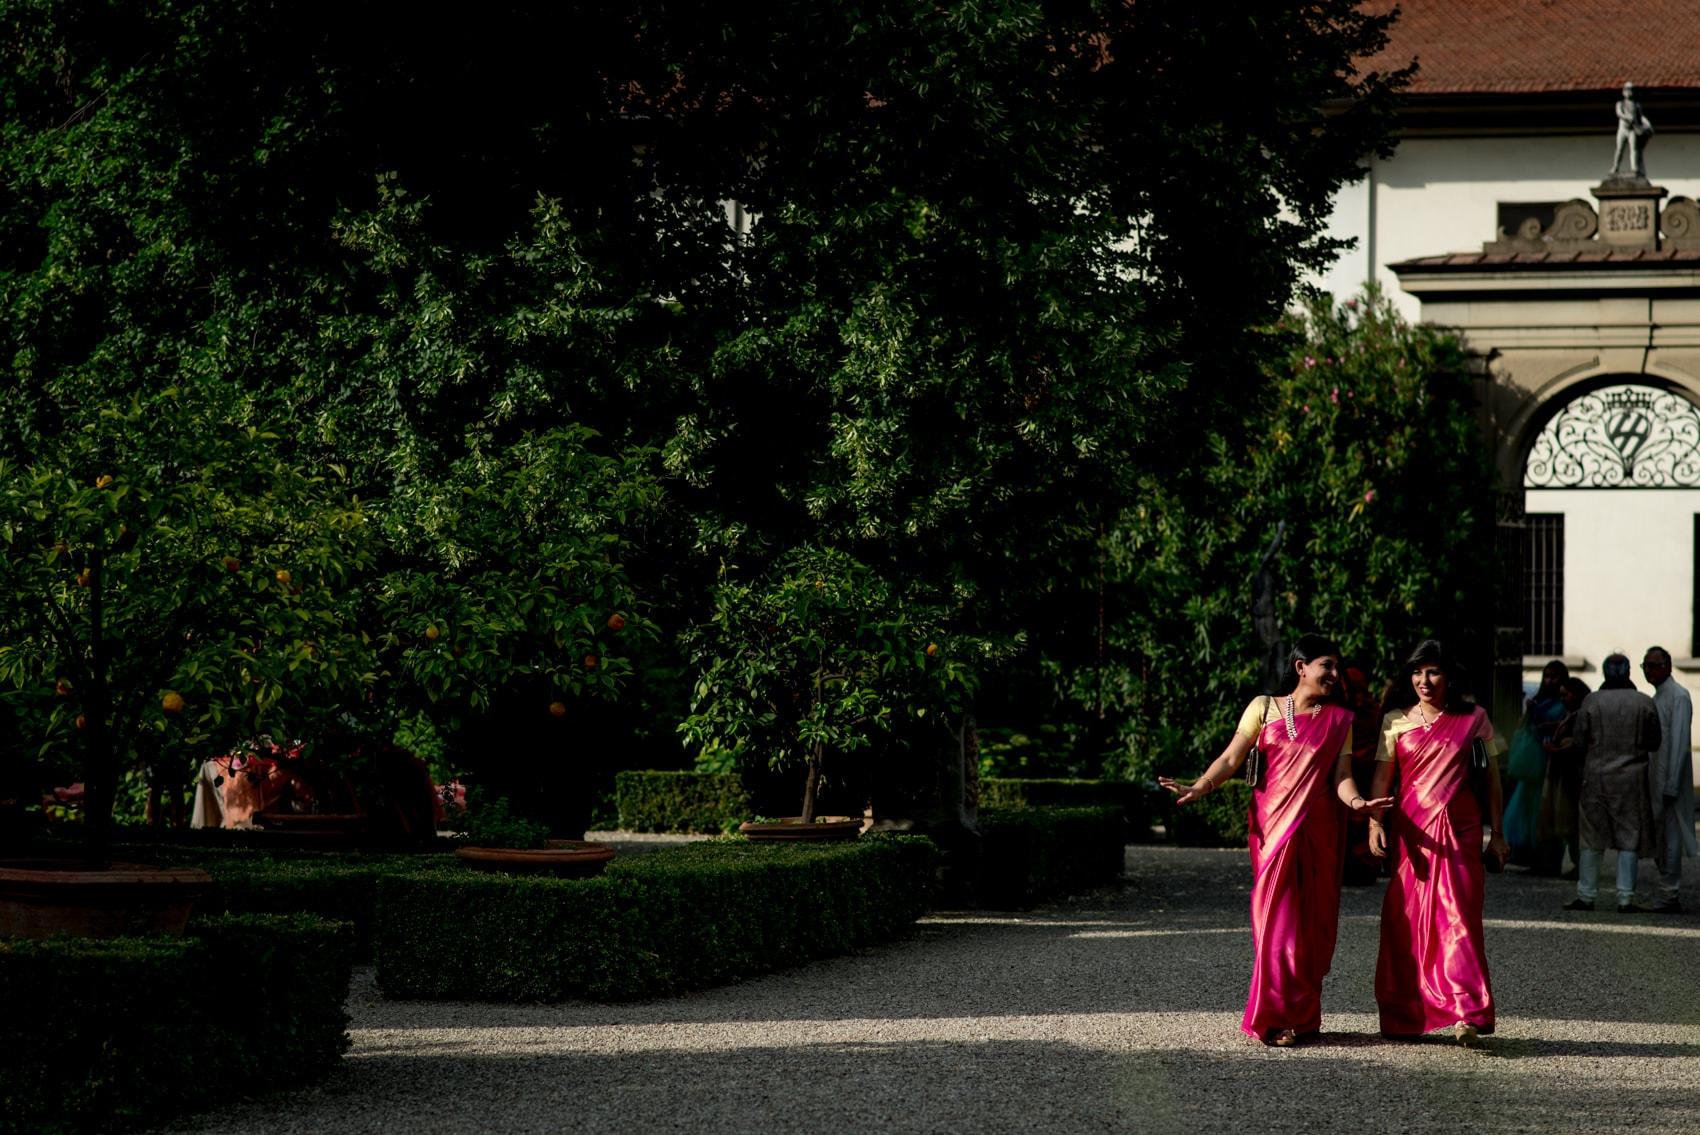 wedding guests exploring Giardino Corsini al Prato